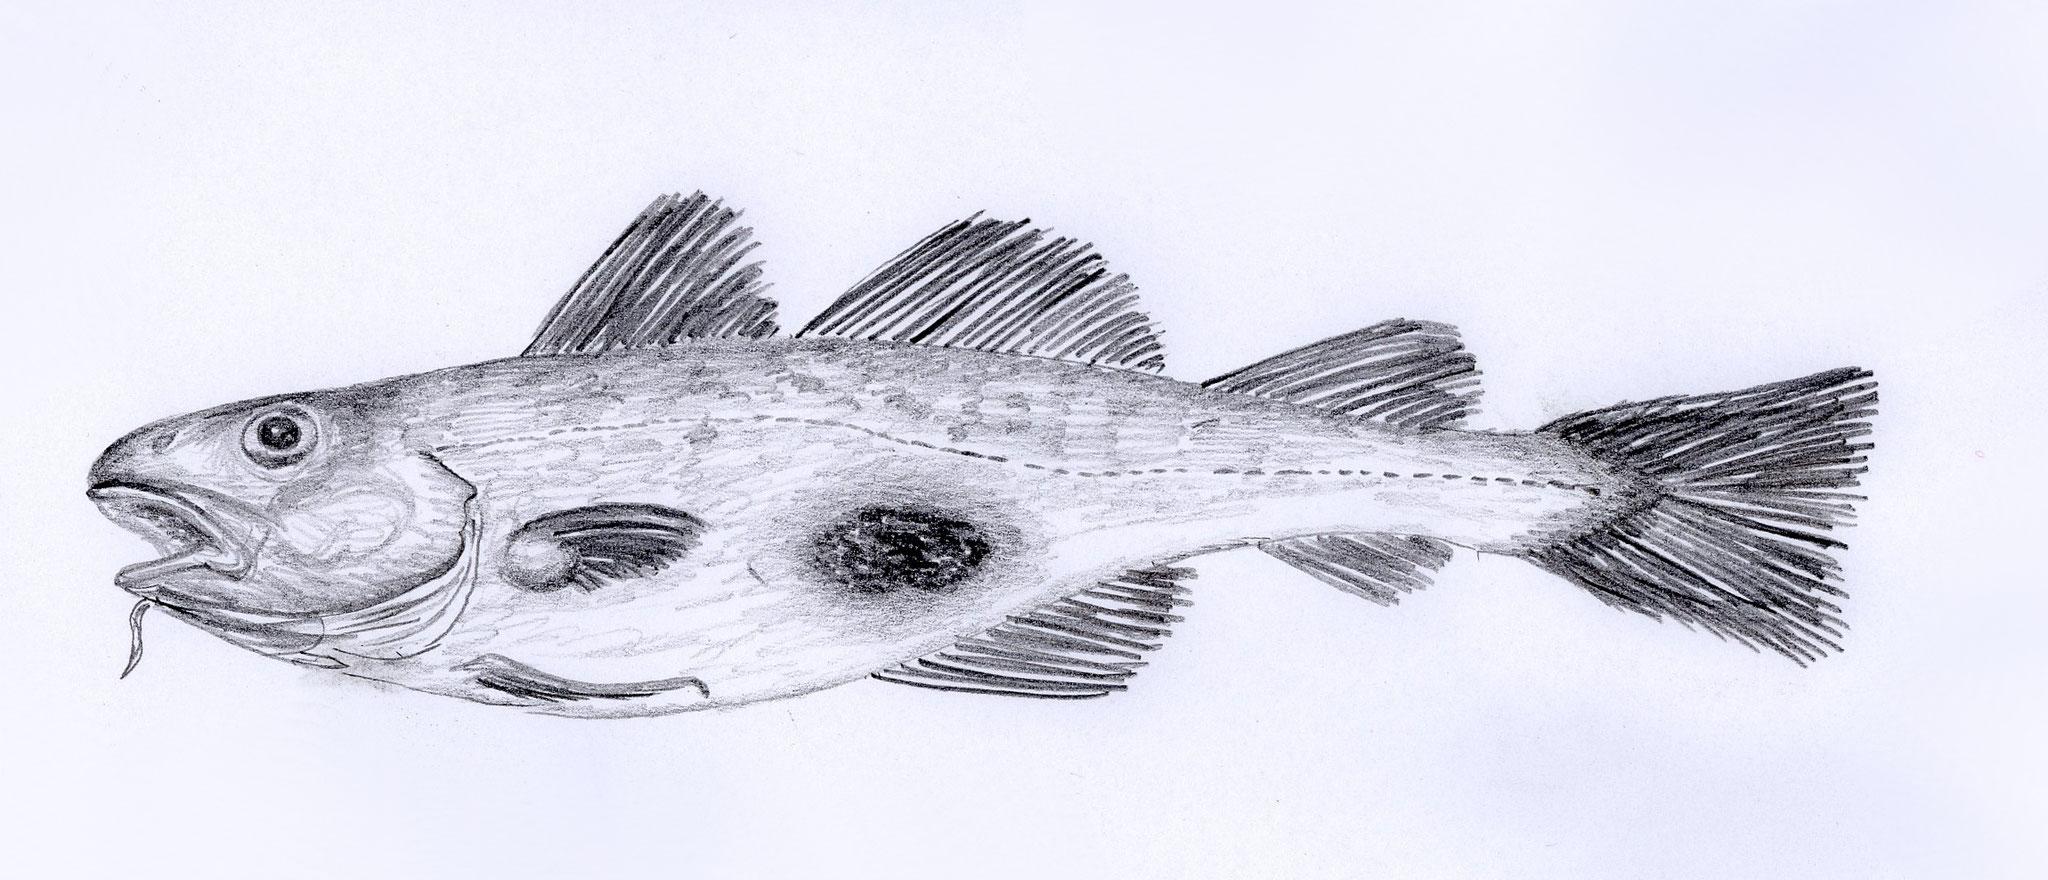 Dorsch mit Hautläsion bakteriellen Ursprungs, 2005, Bleistift auf Papier, 30 x 21 cm